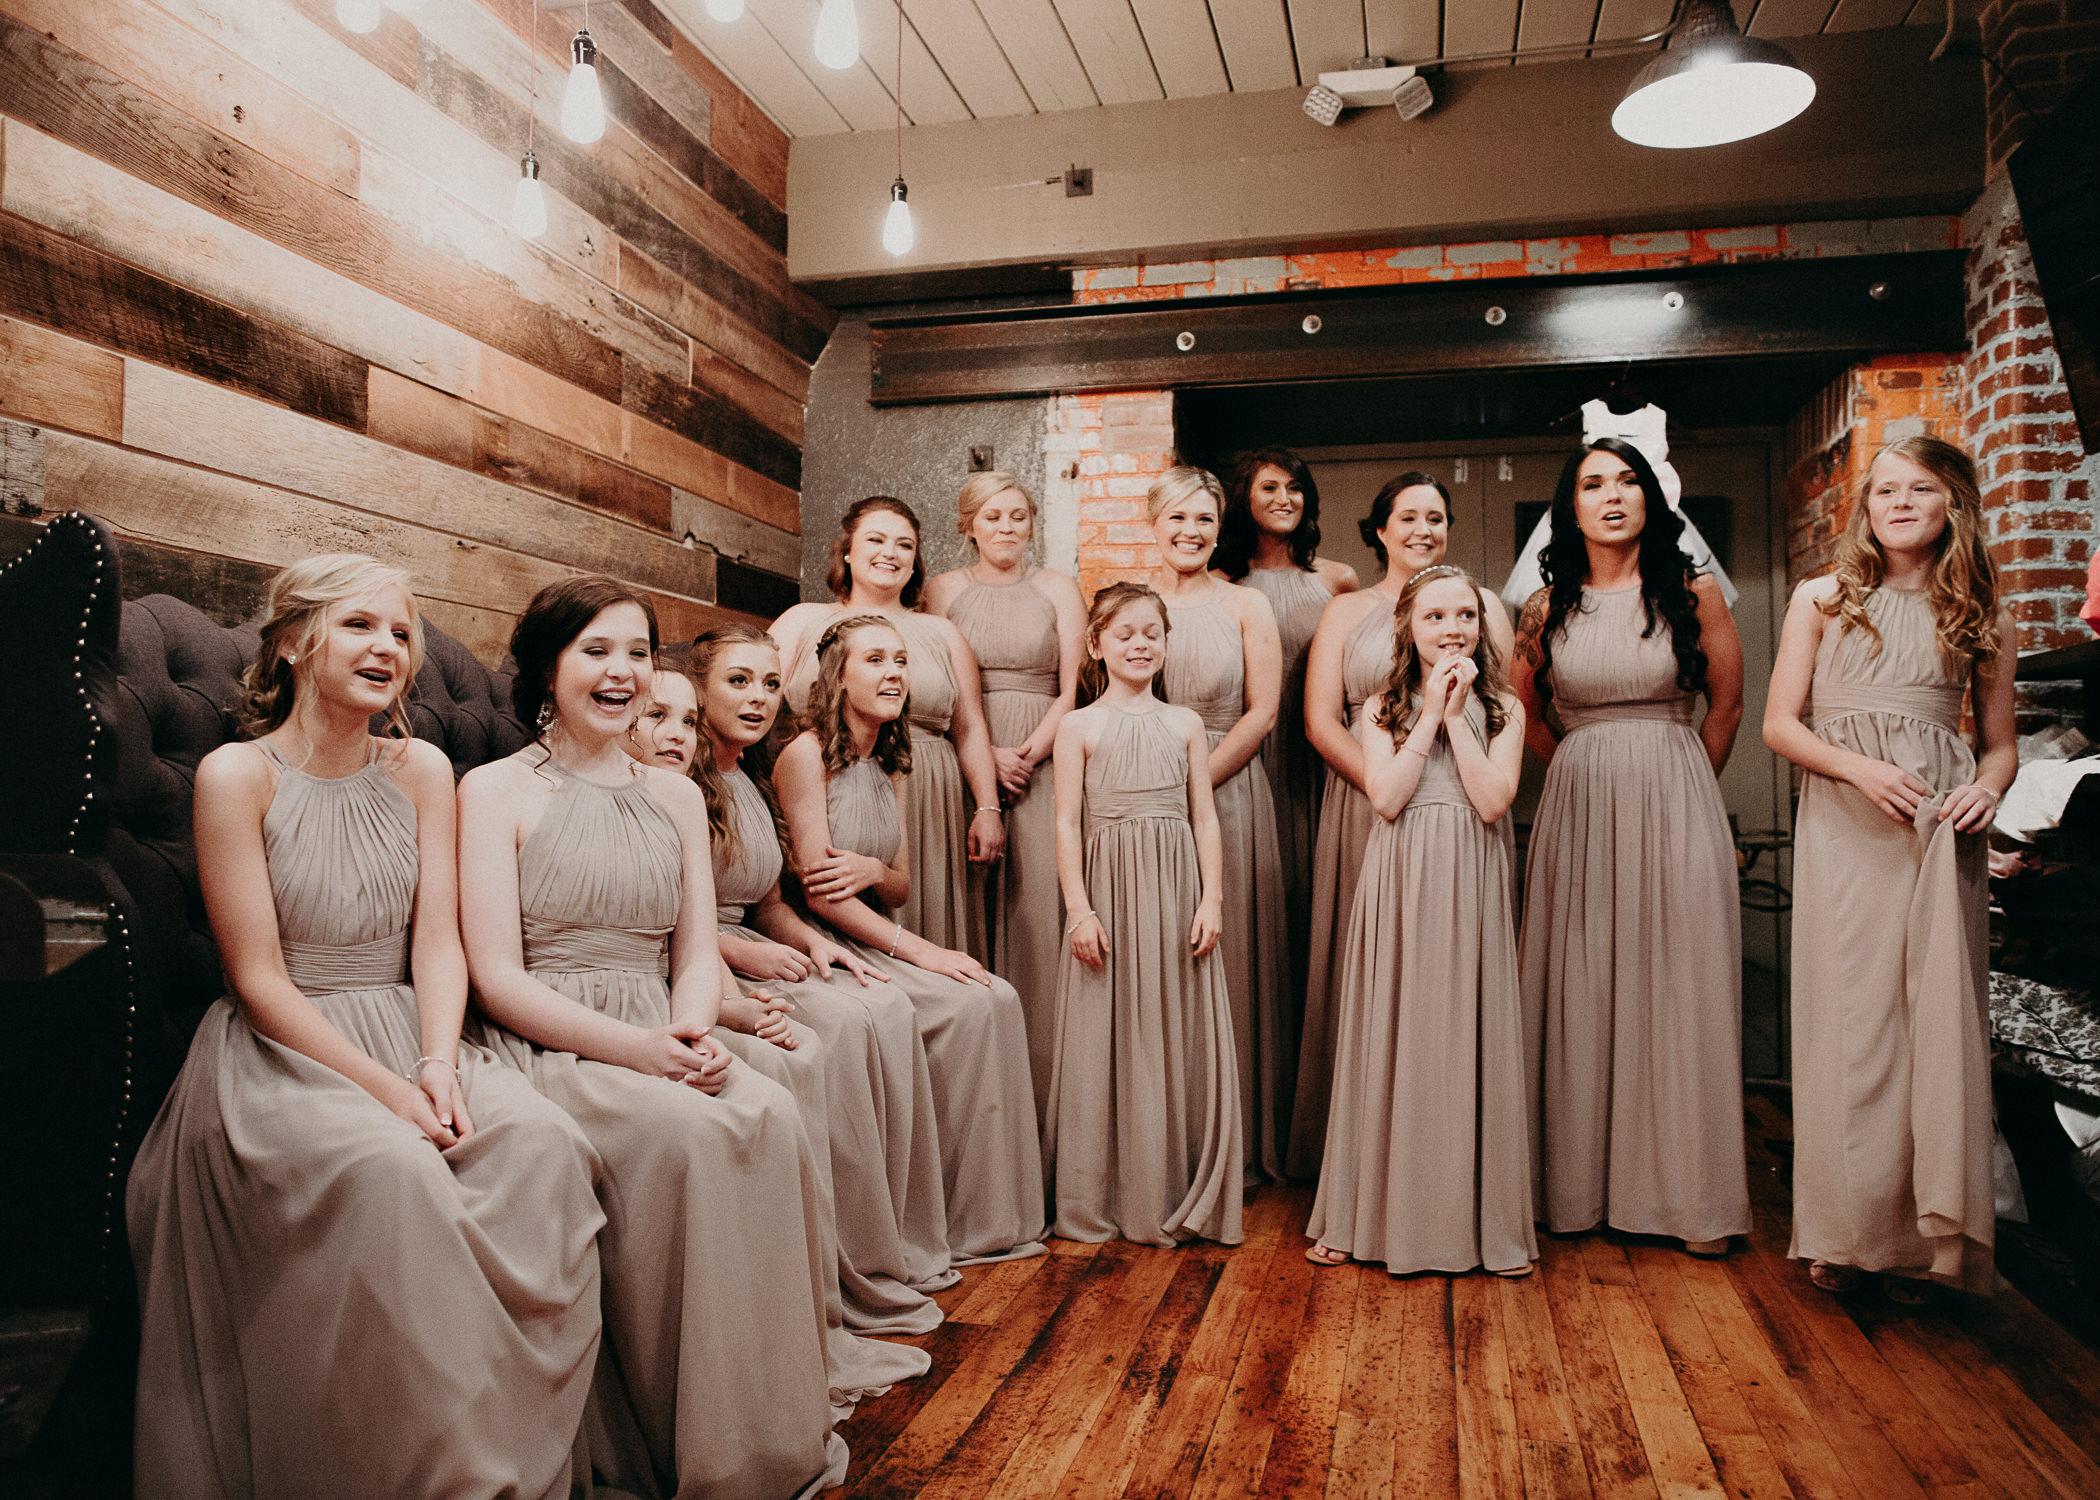 12 4 - Atlanta Wedding Photographer - The engine room - Ga - Wedding trends - Aline Marin Photography.jpg